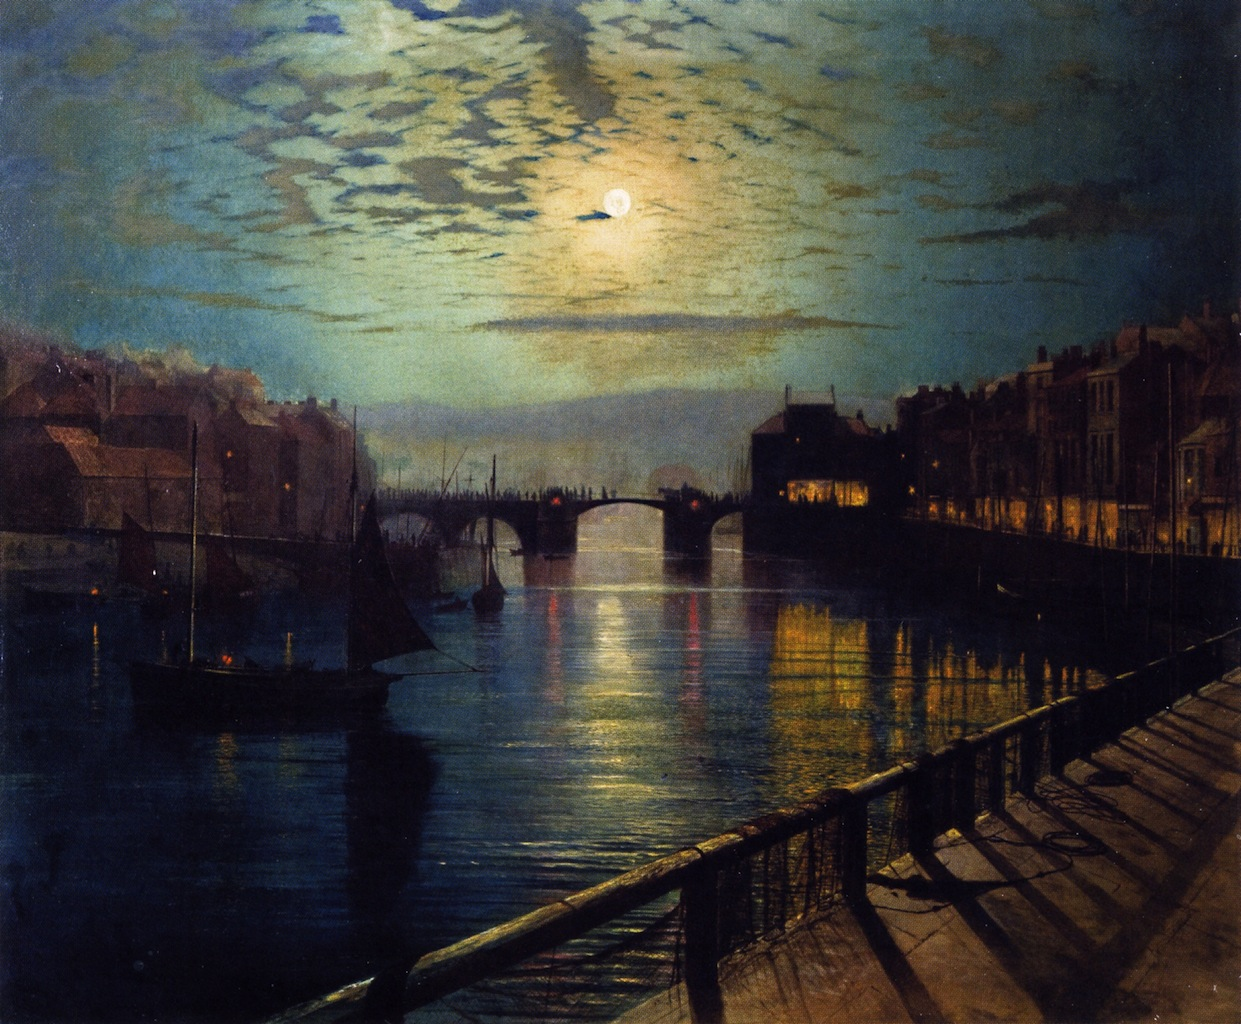 Whitby Harbor by Moonlight - John Atkinson Grimshaw